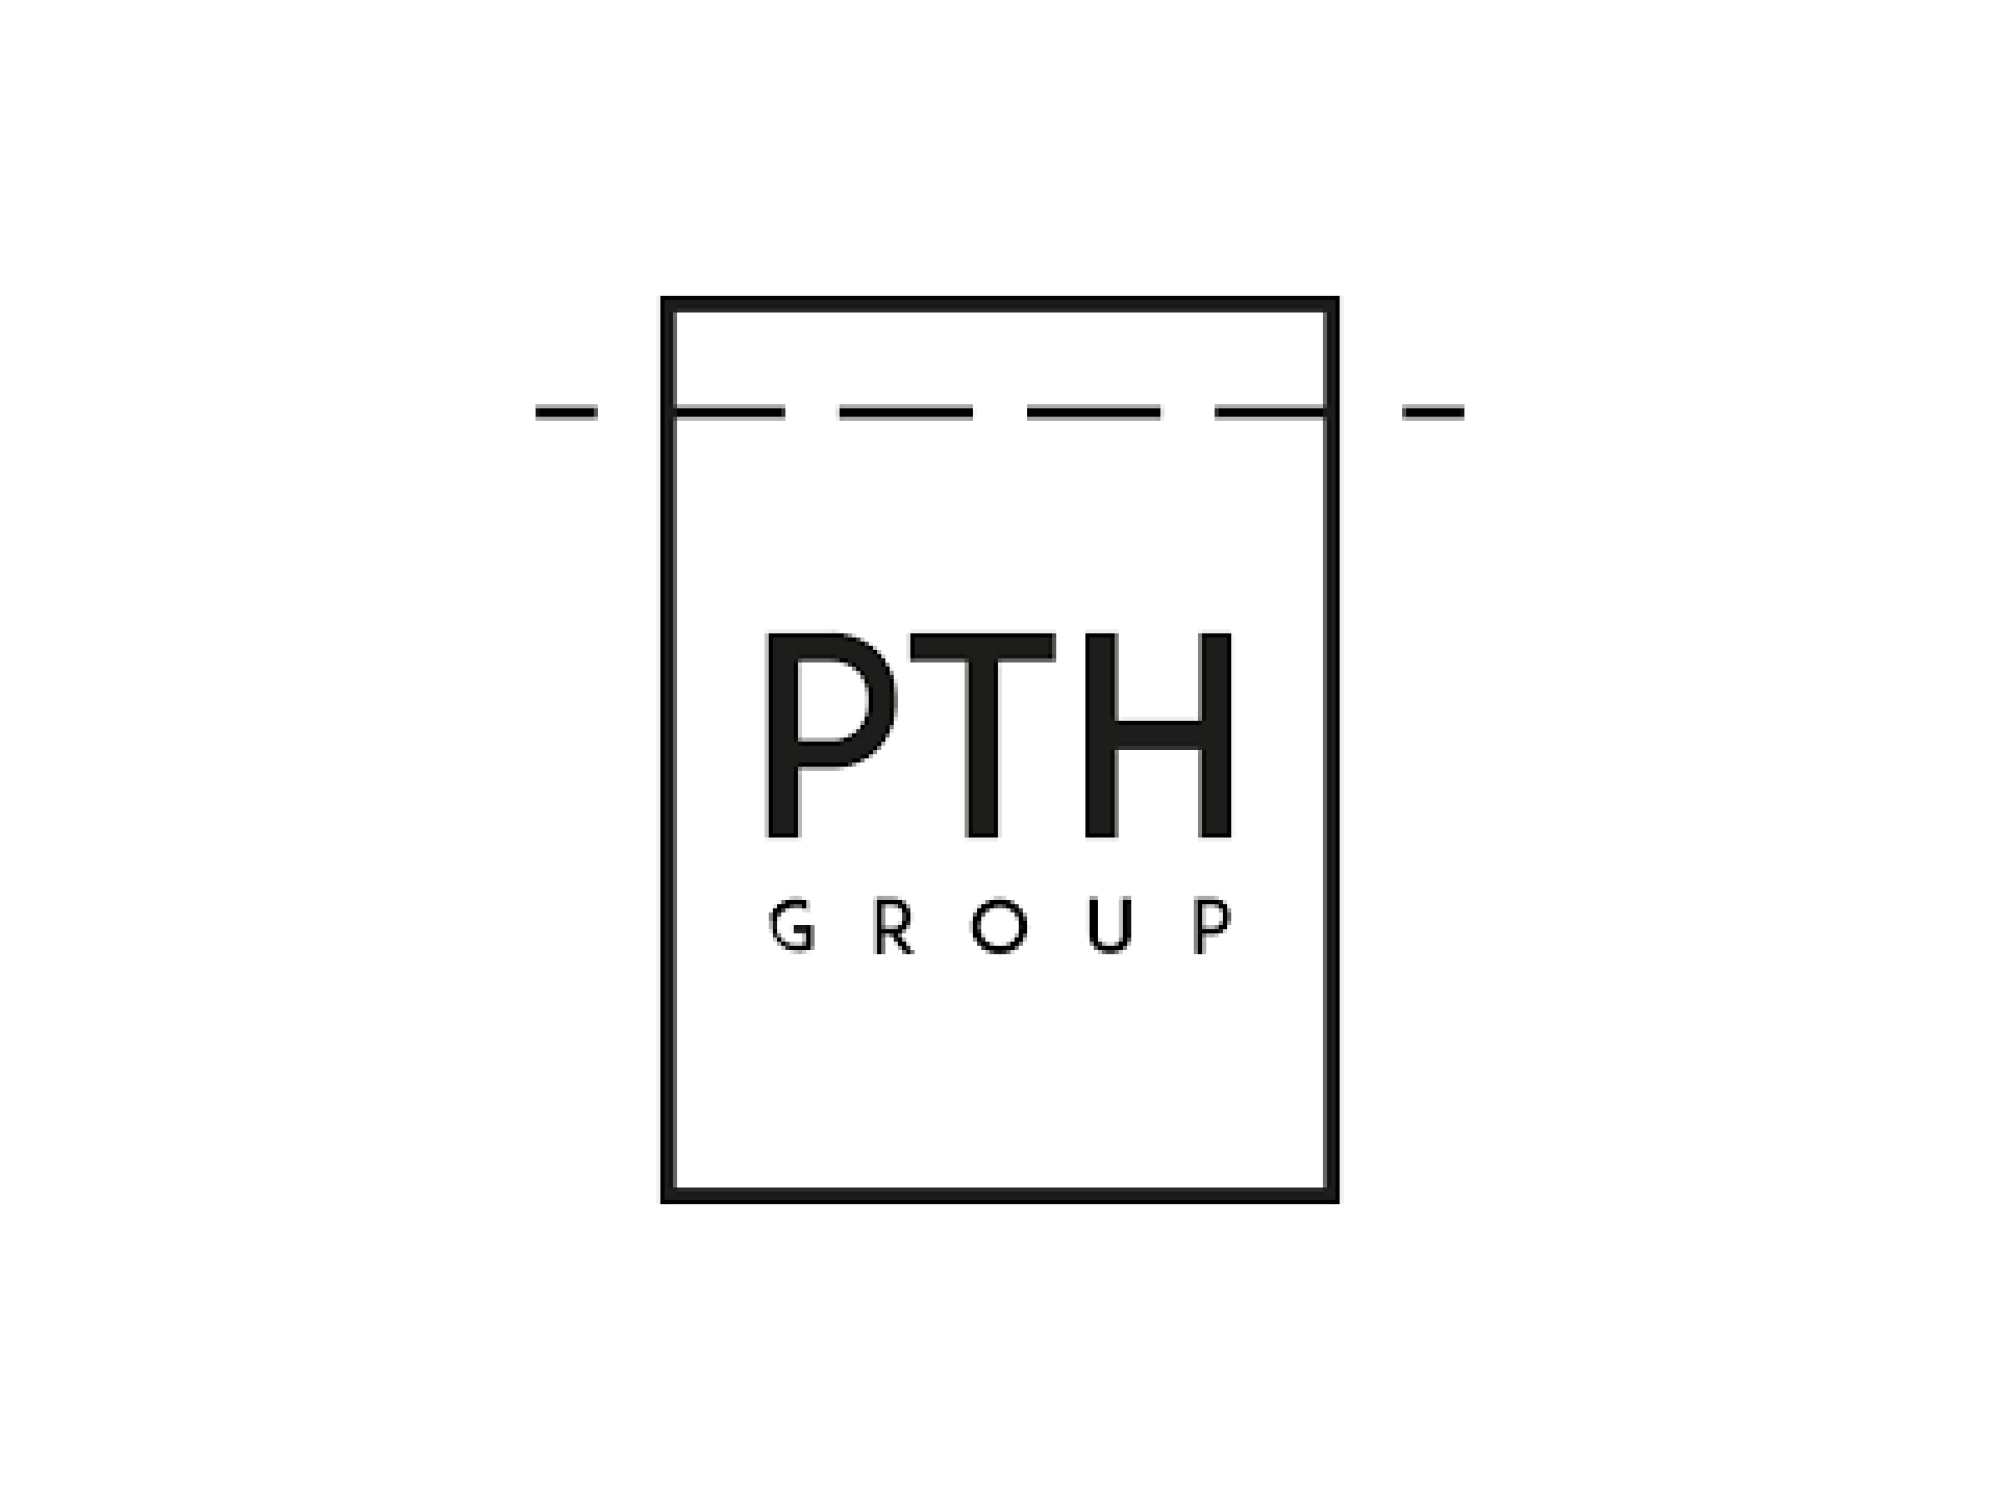 PTH Group